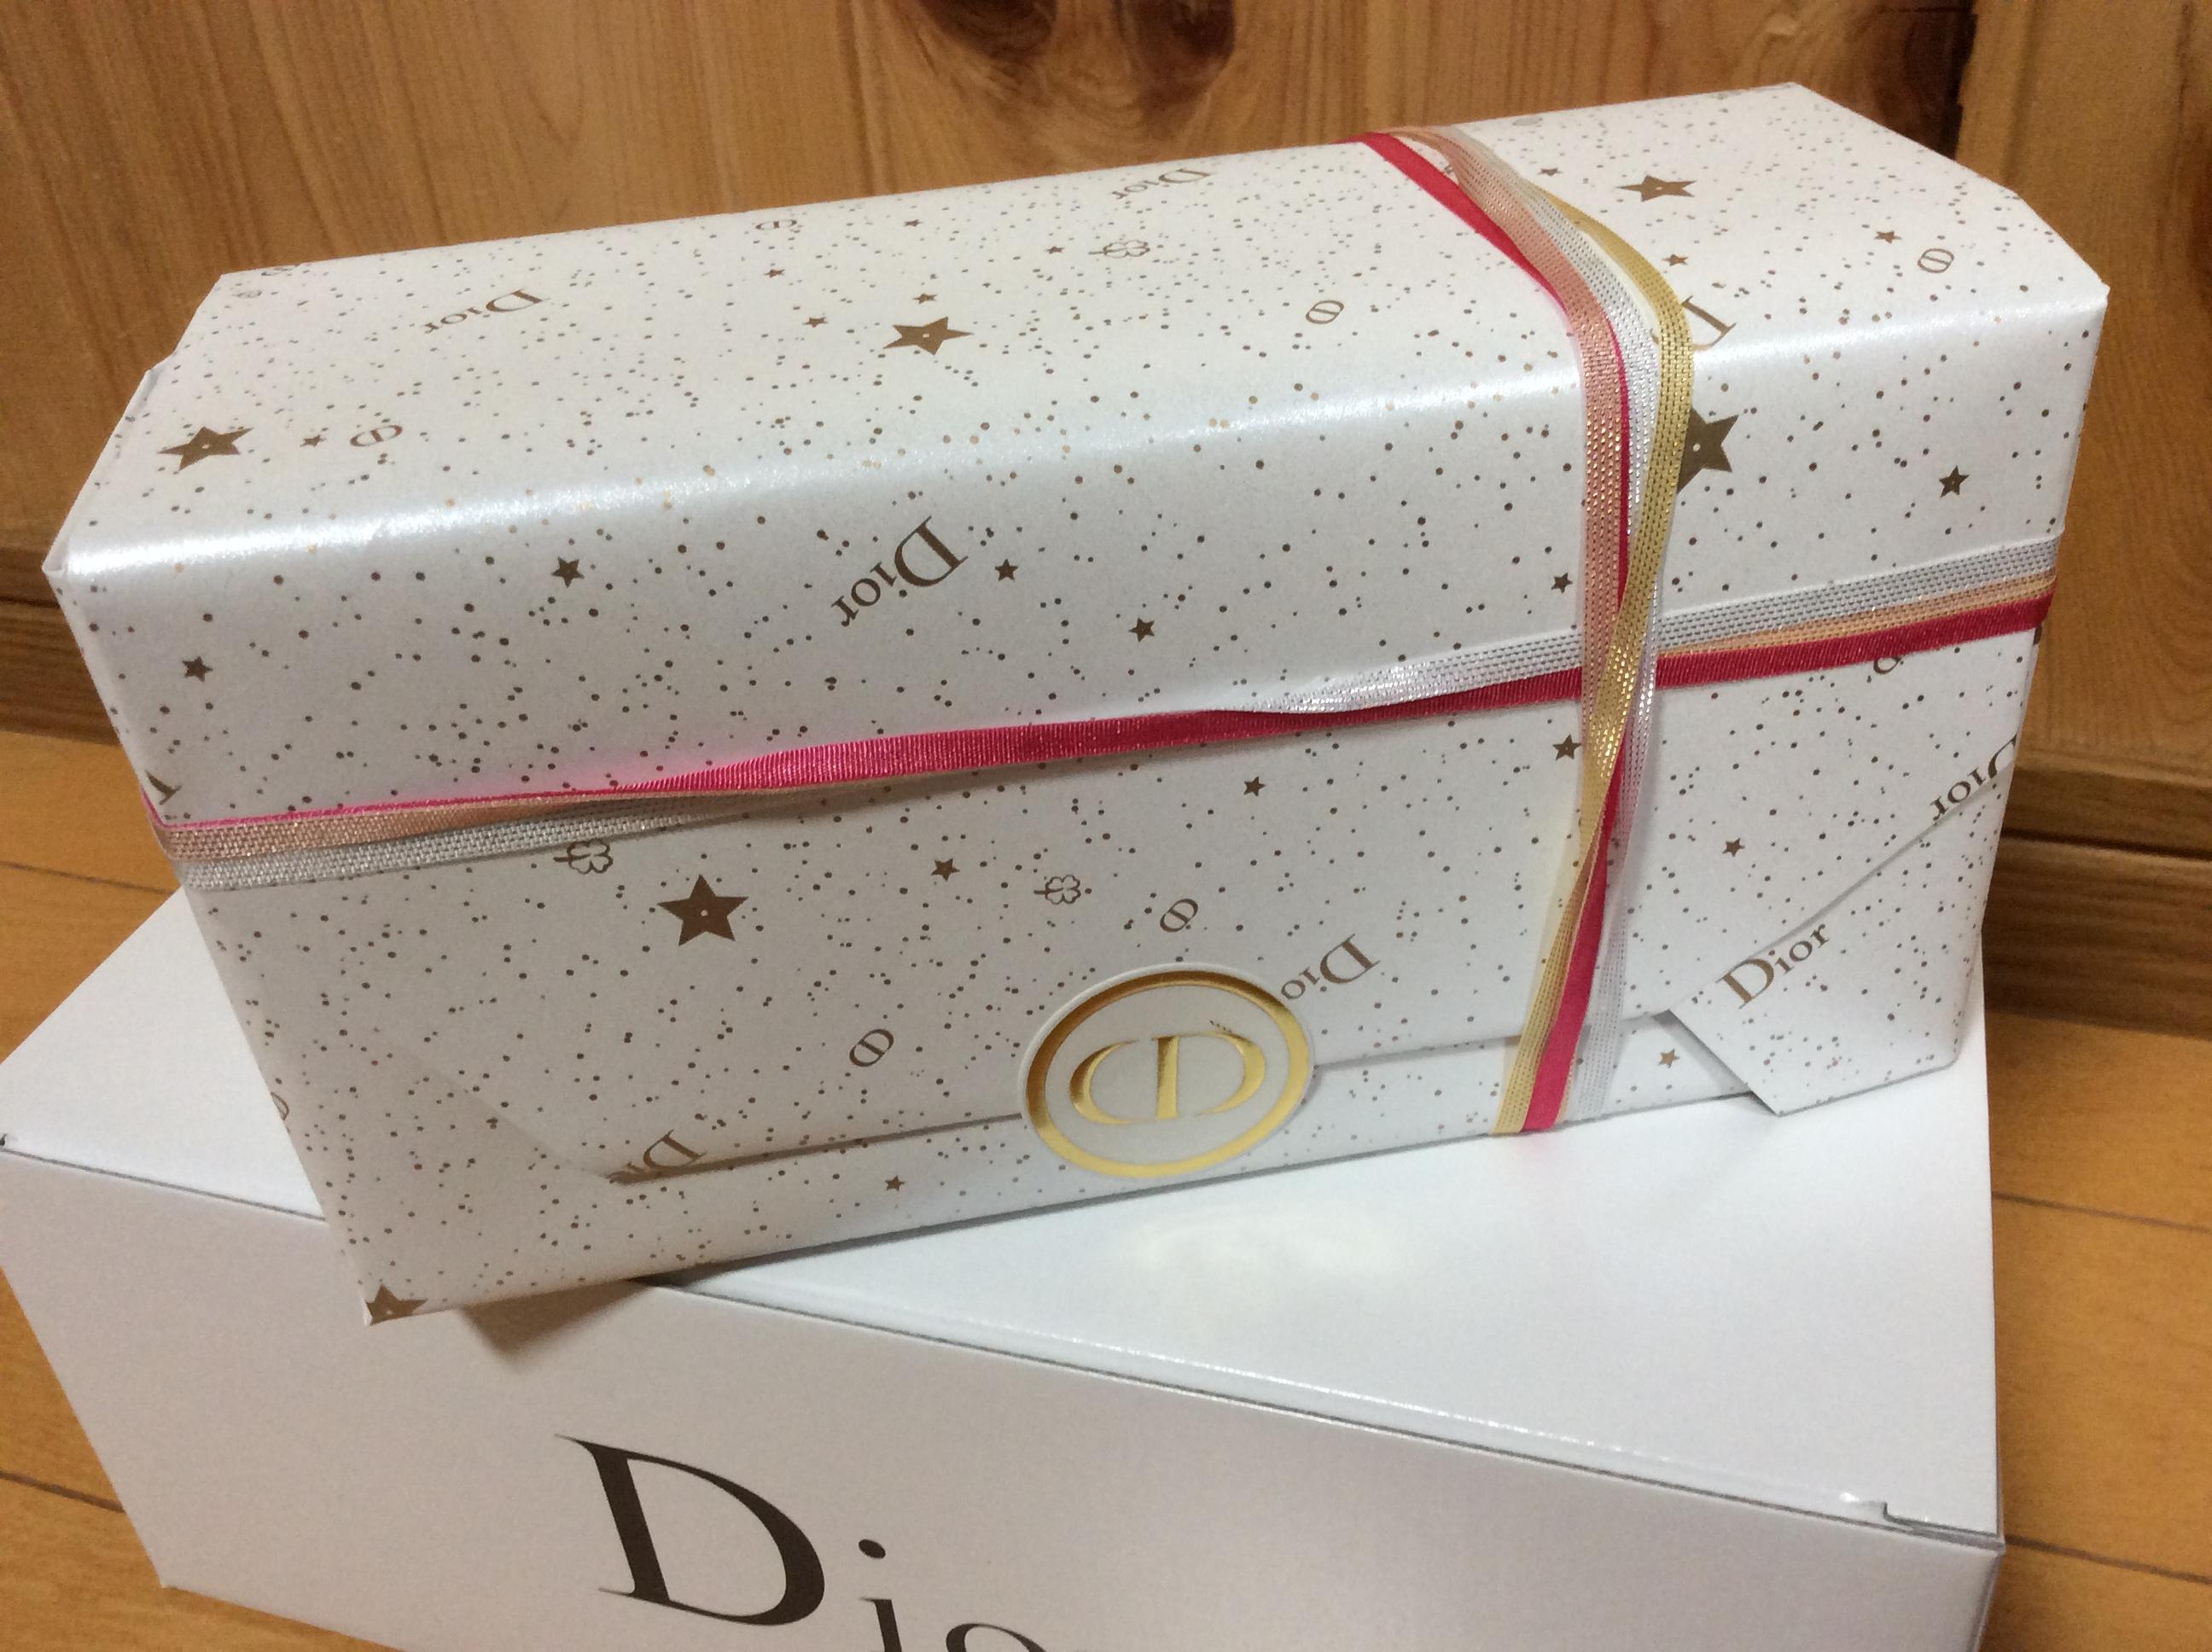 Dior ディオール クリスマスコフレ プレステージ ラッピング 包装